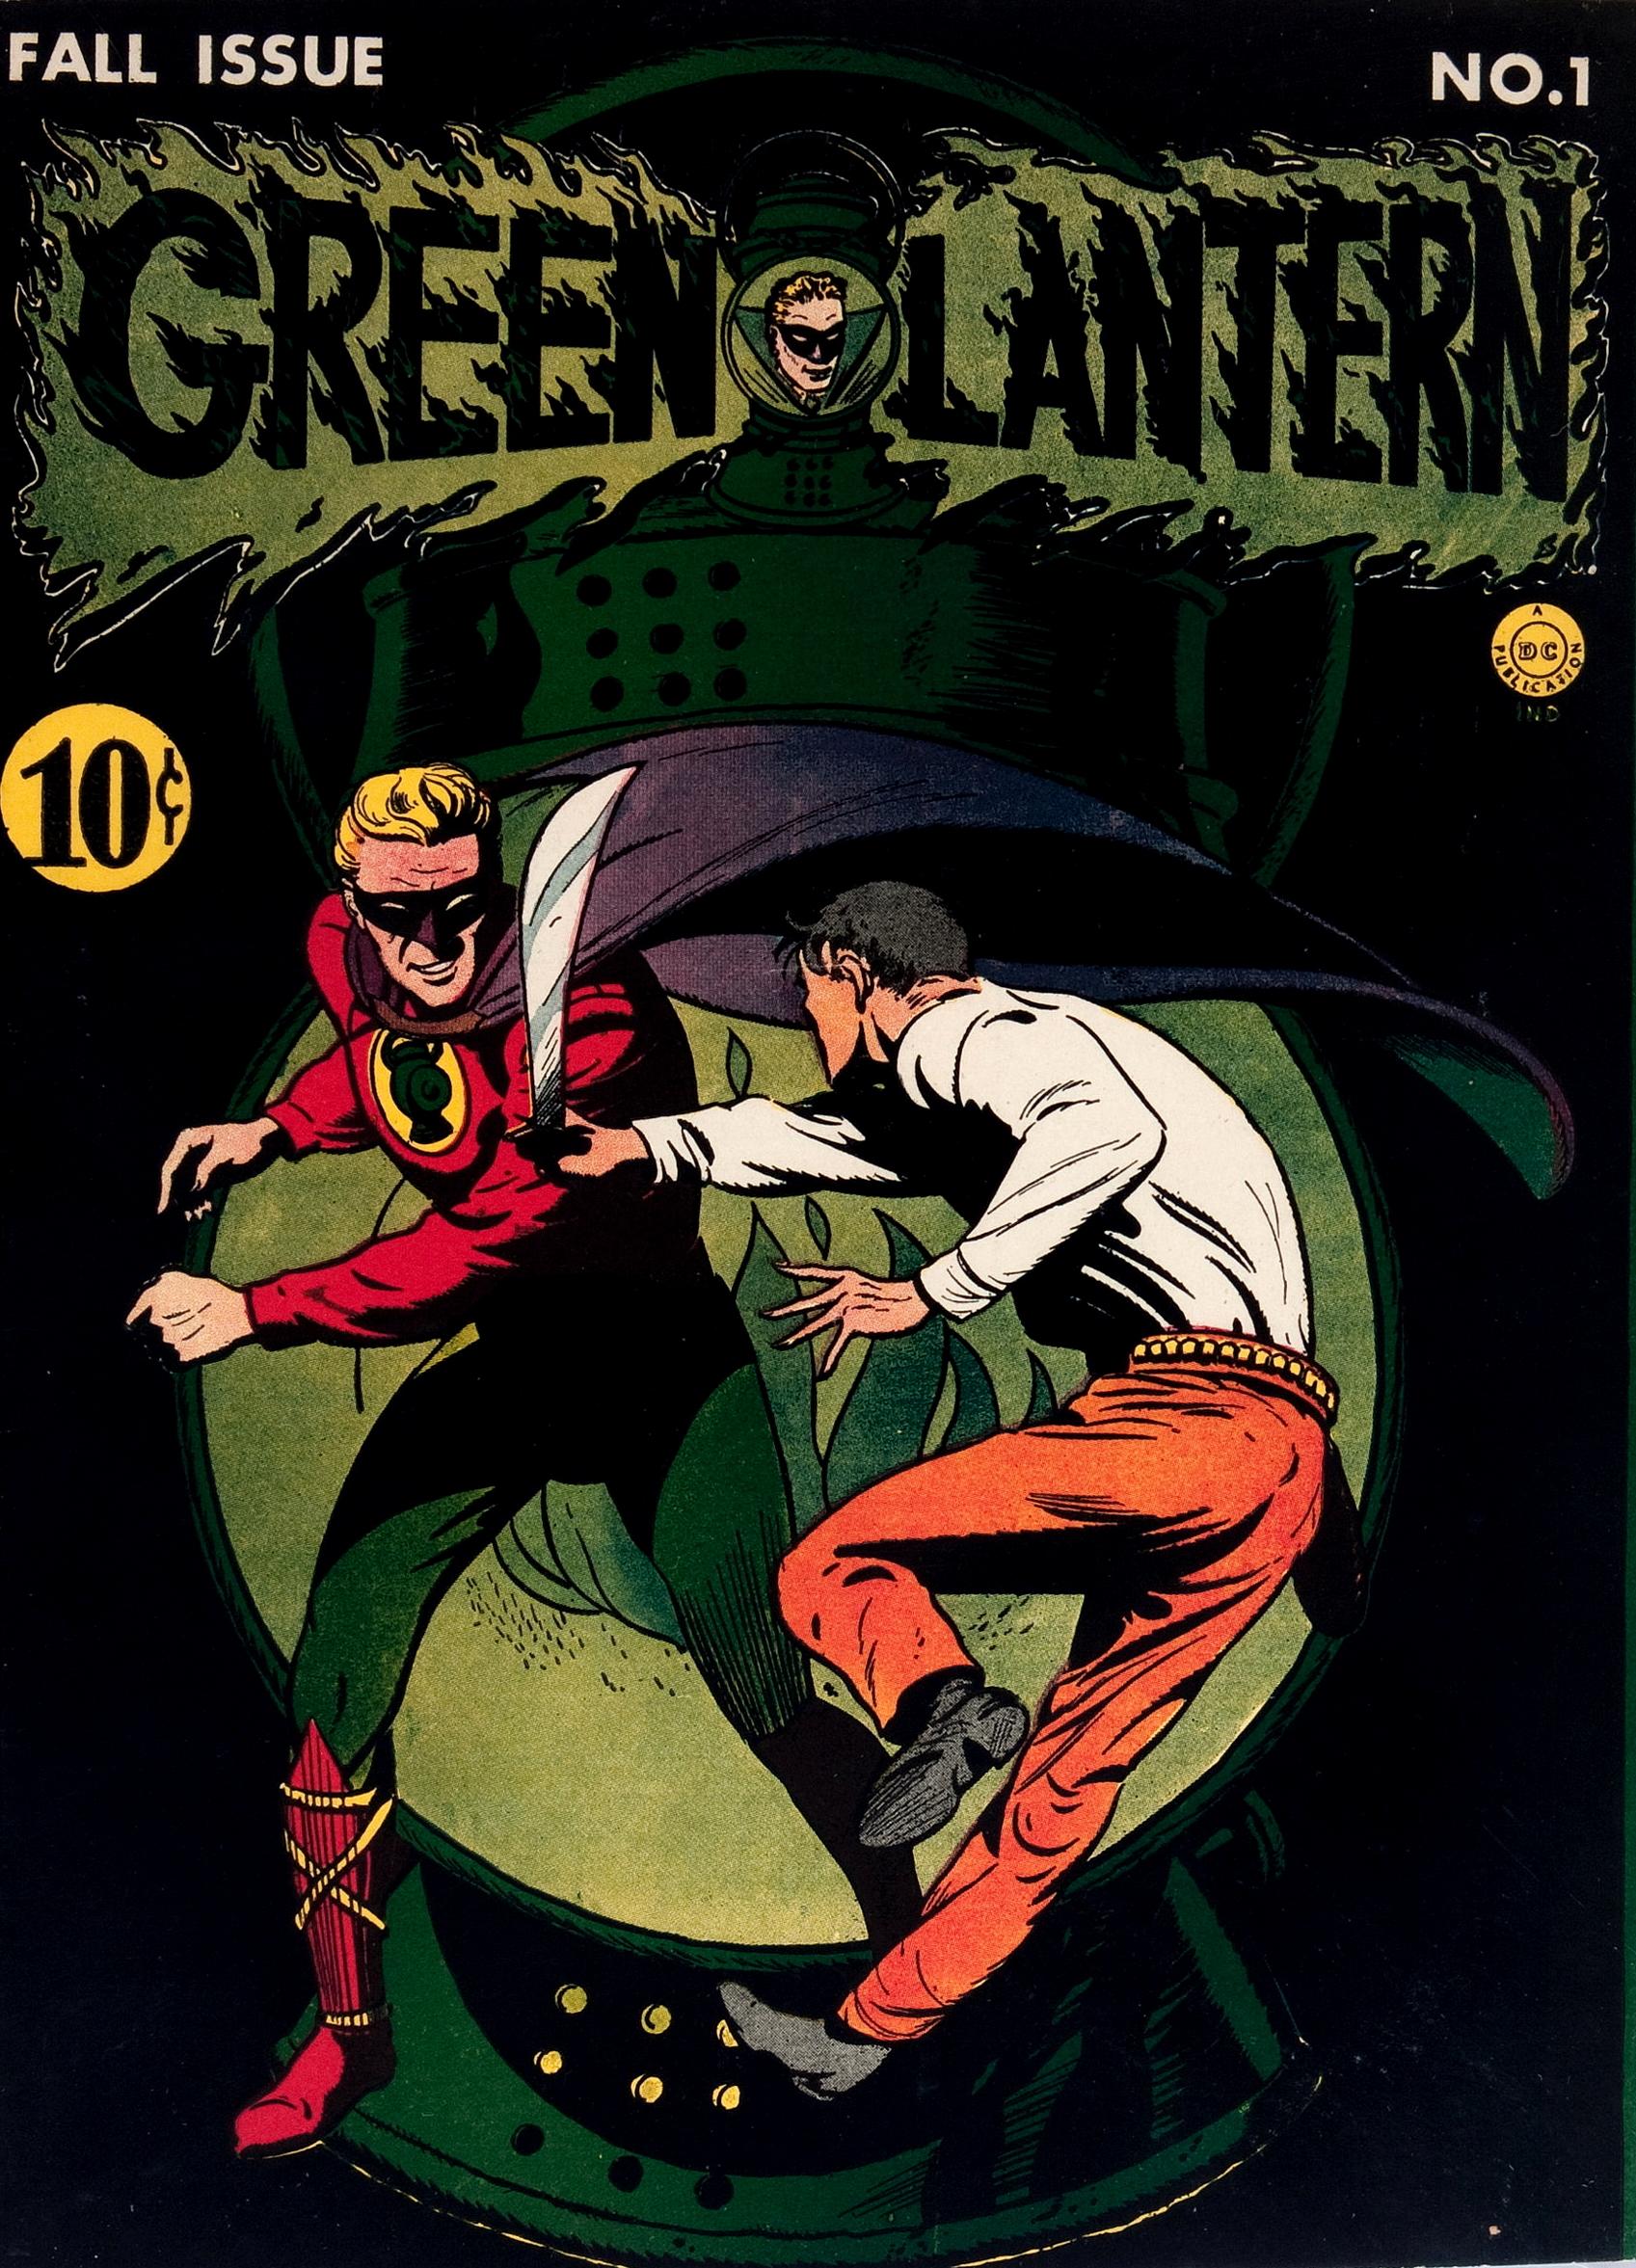 Green_Lantern_Vol_1_1.jpg